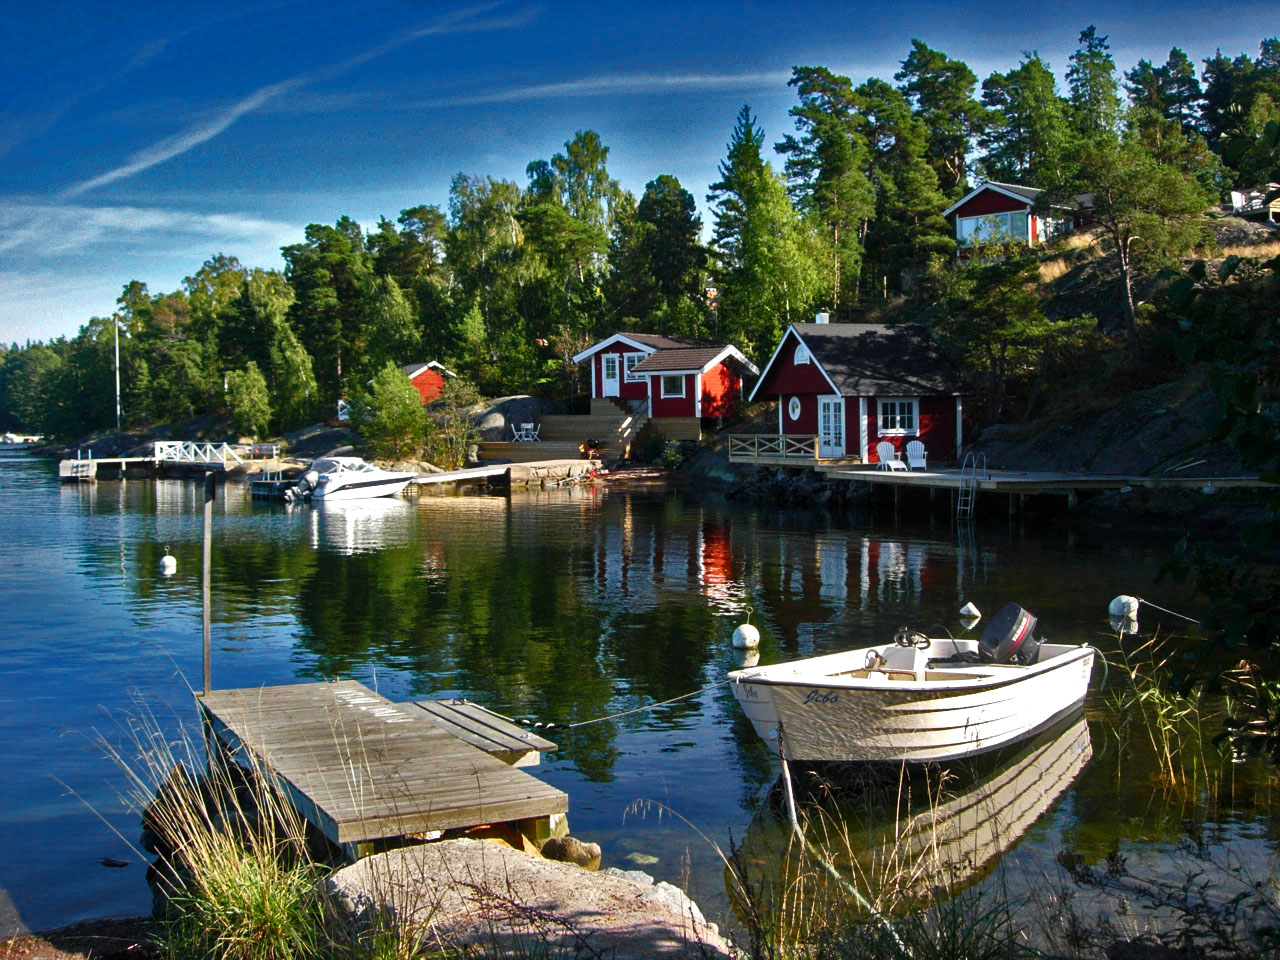 060214-The-Stockholm-Archipelago